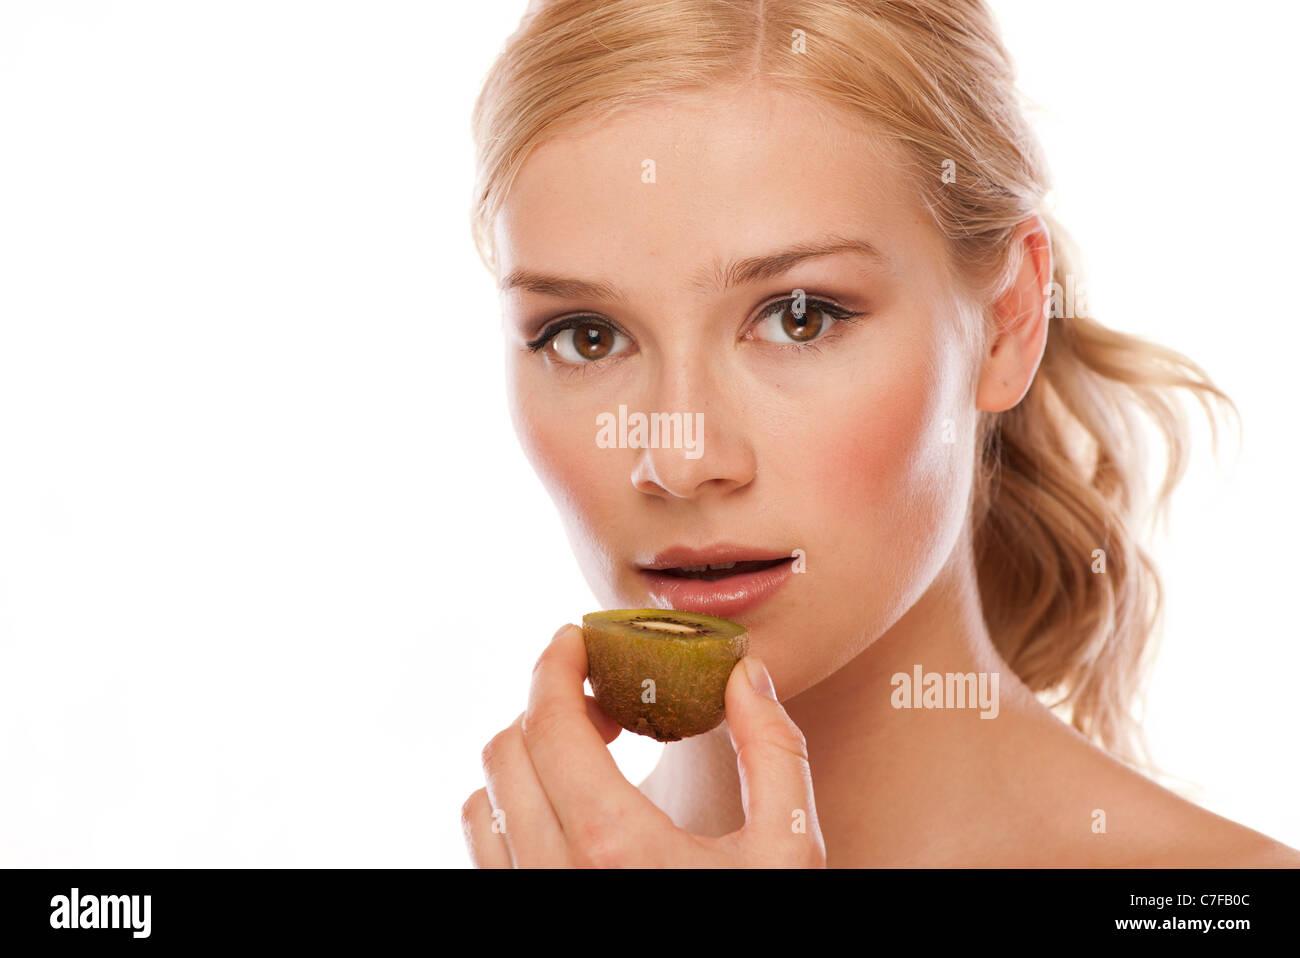 woman eating a kiwi fruit - Stock Image